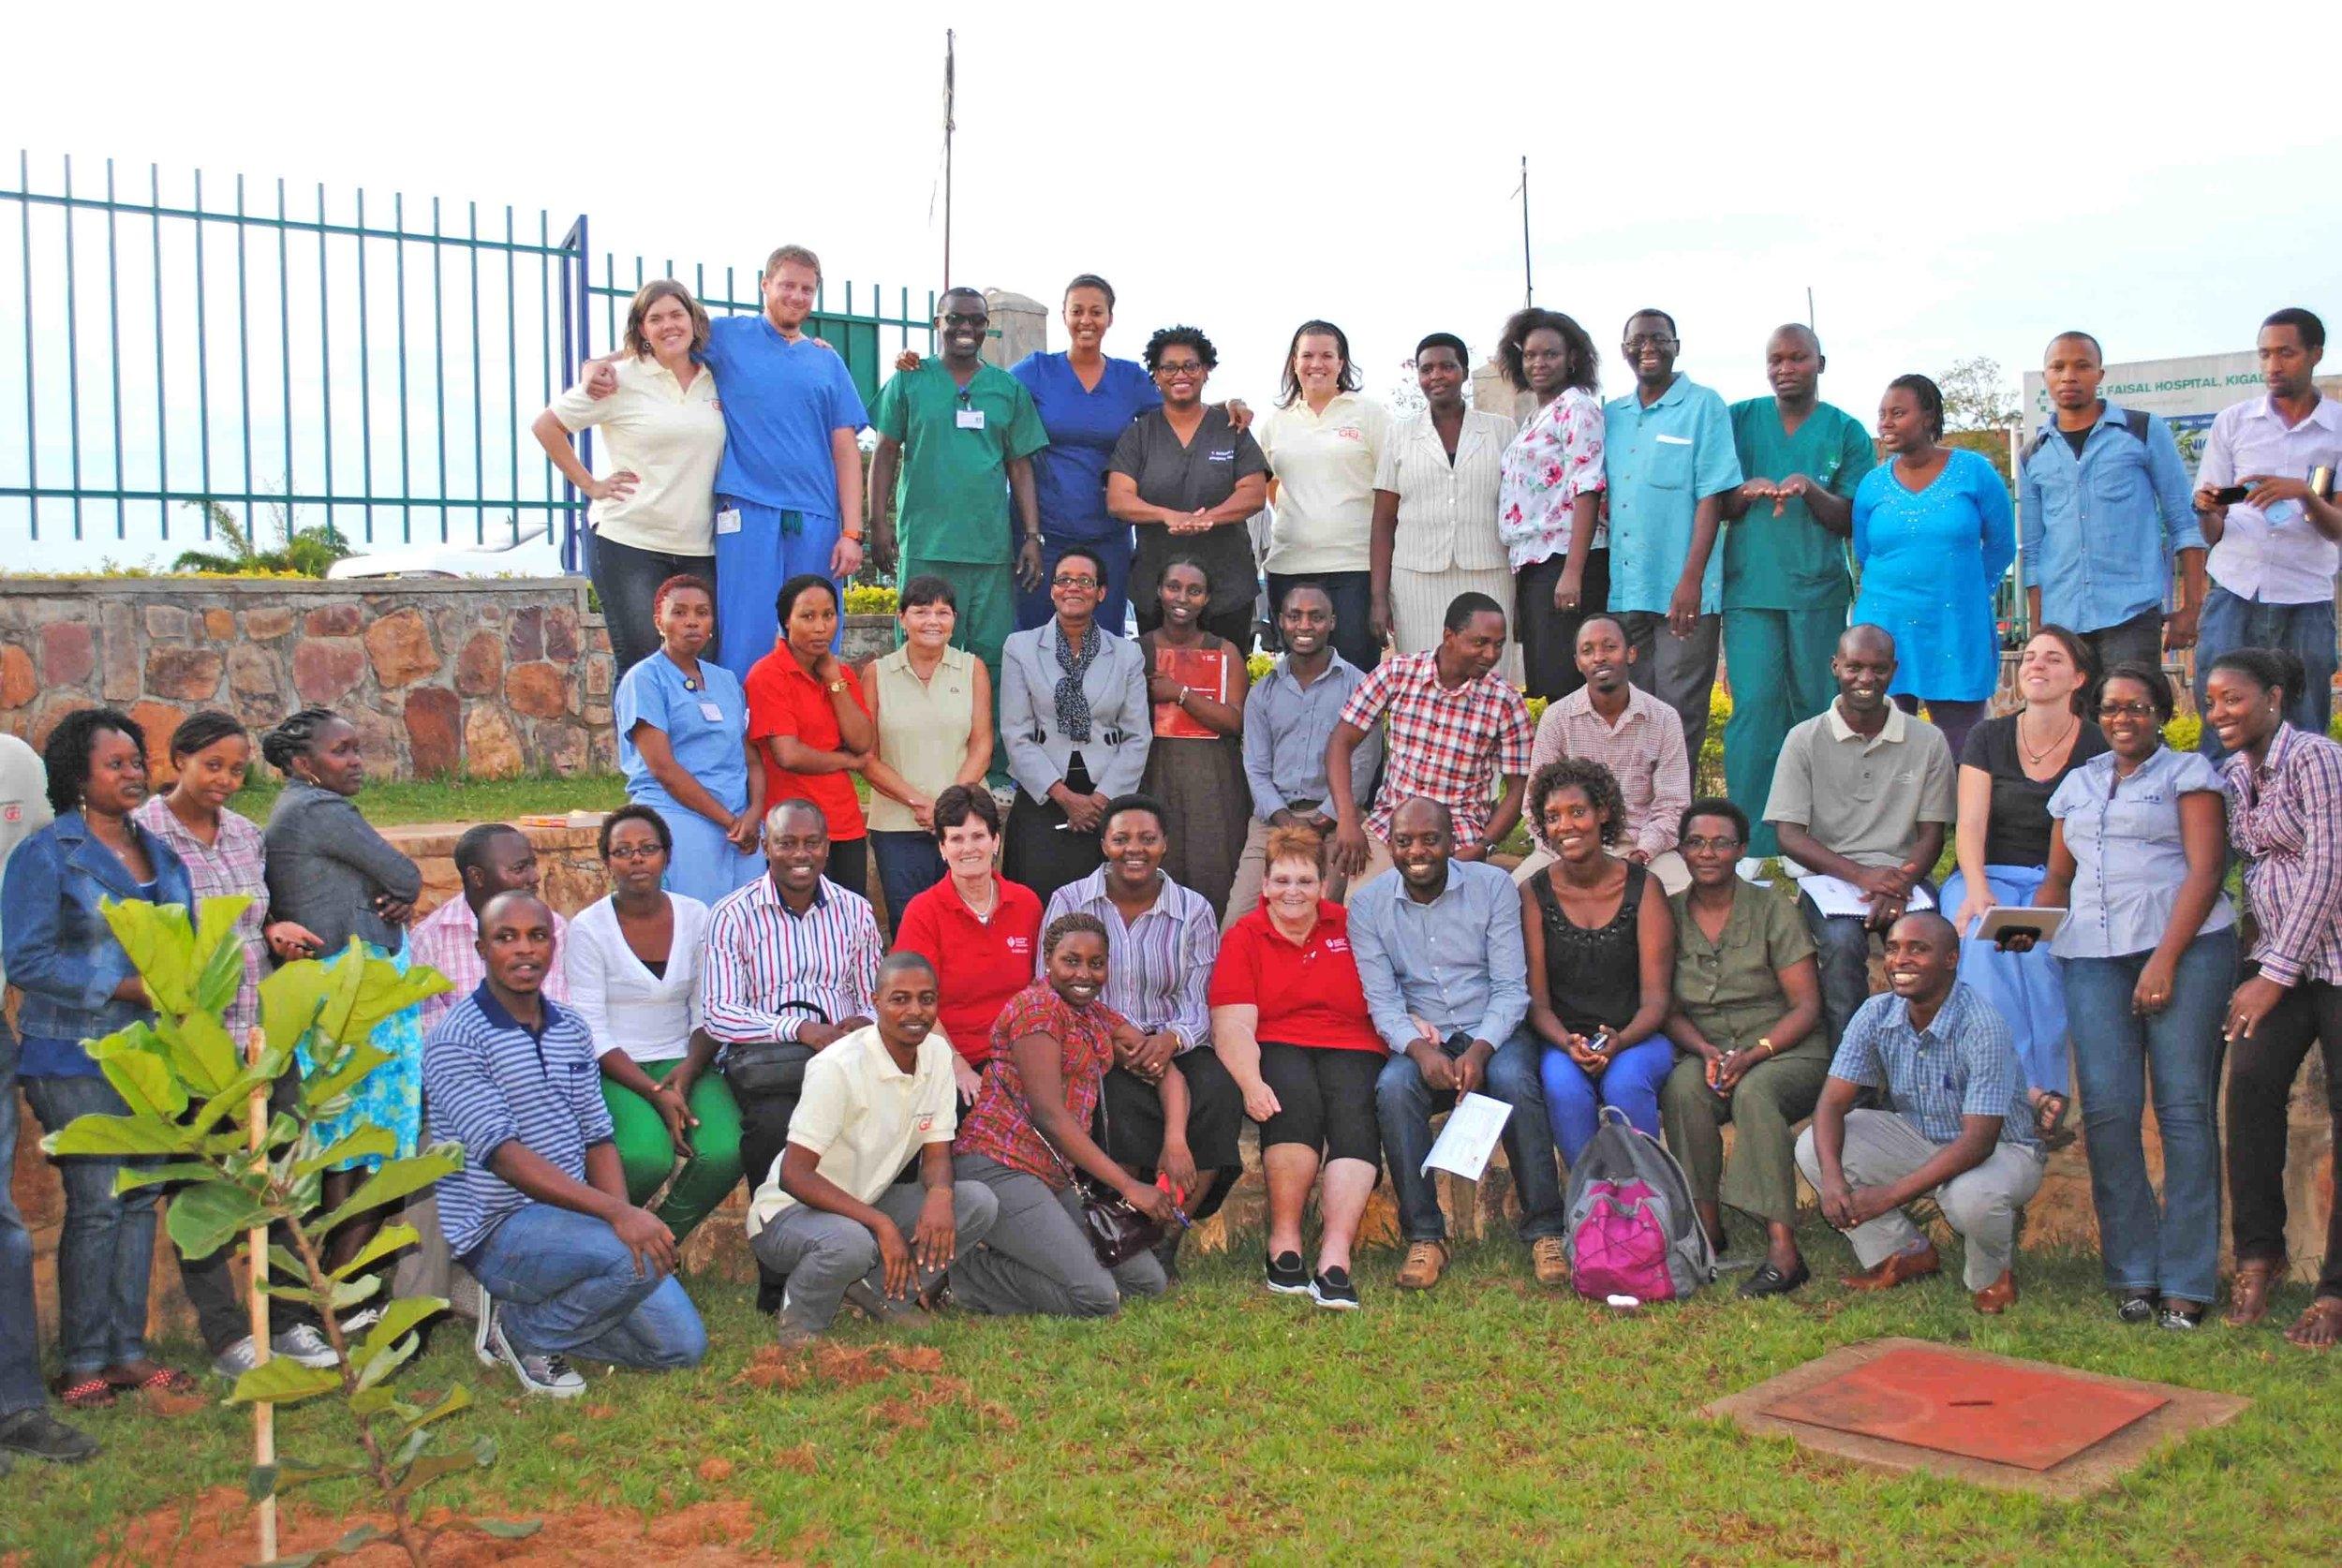 ACLS Graduating class (students and instructors).